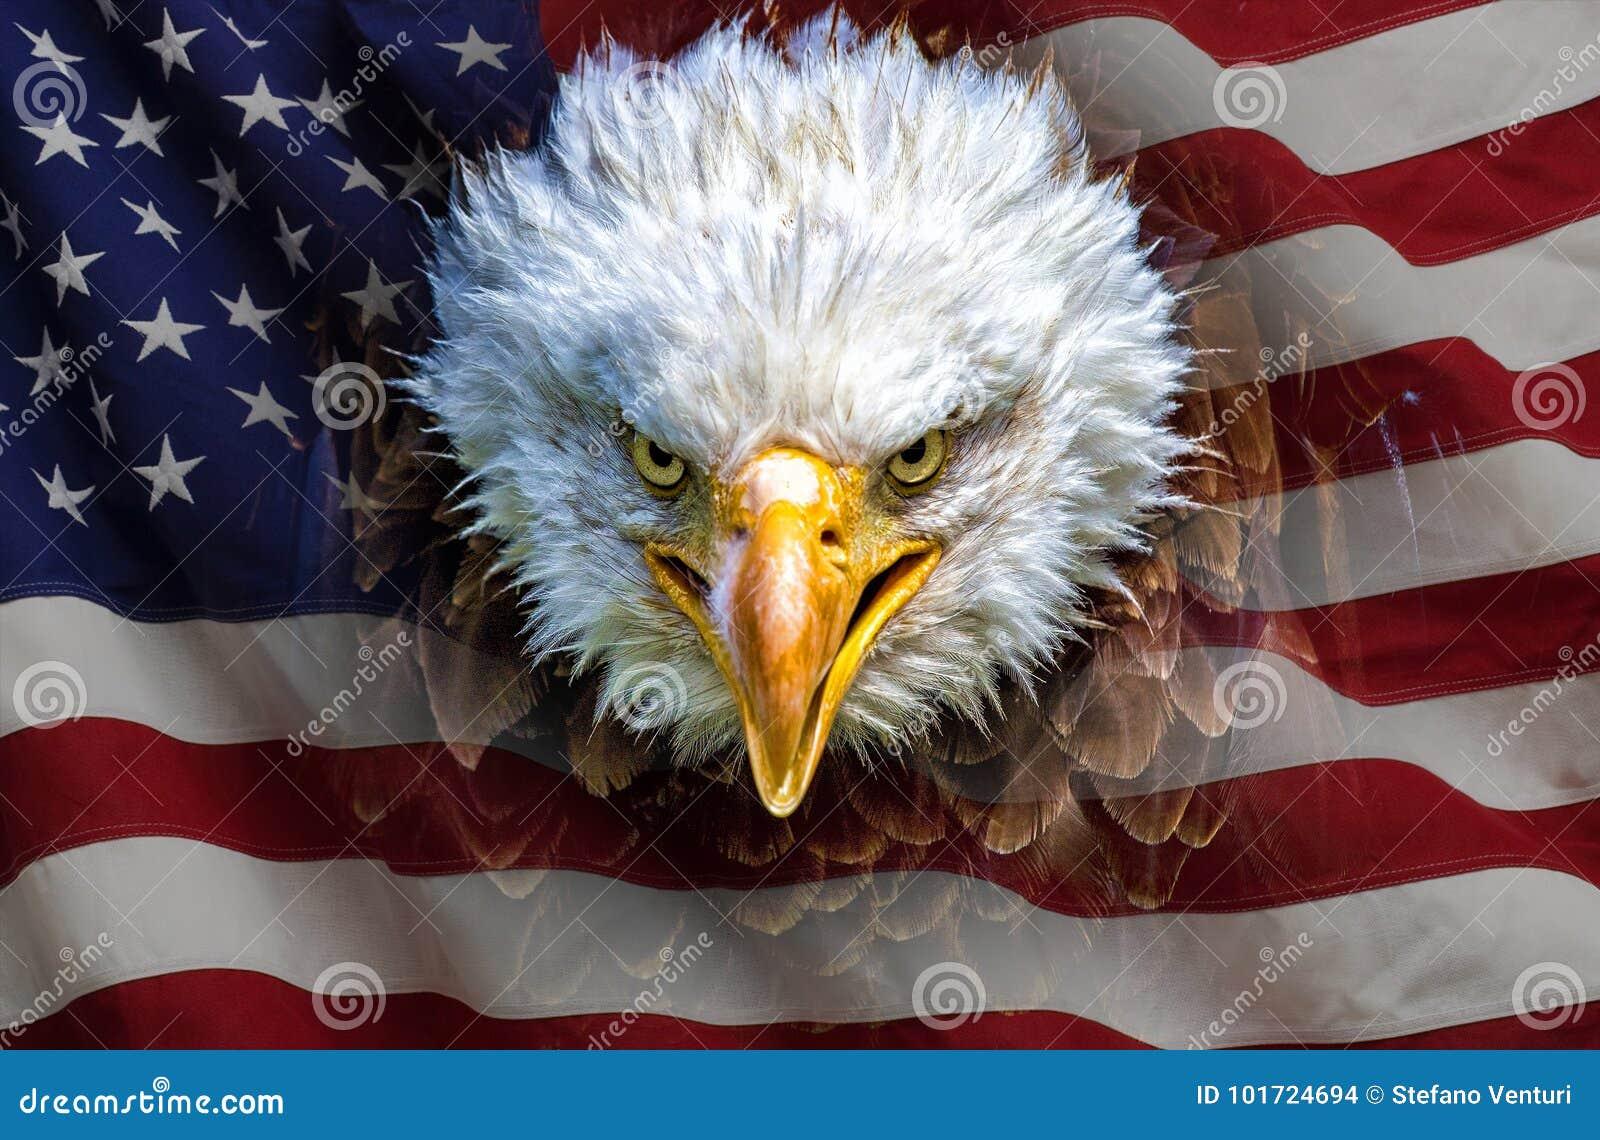 An angry north american bald eagle on american flag